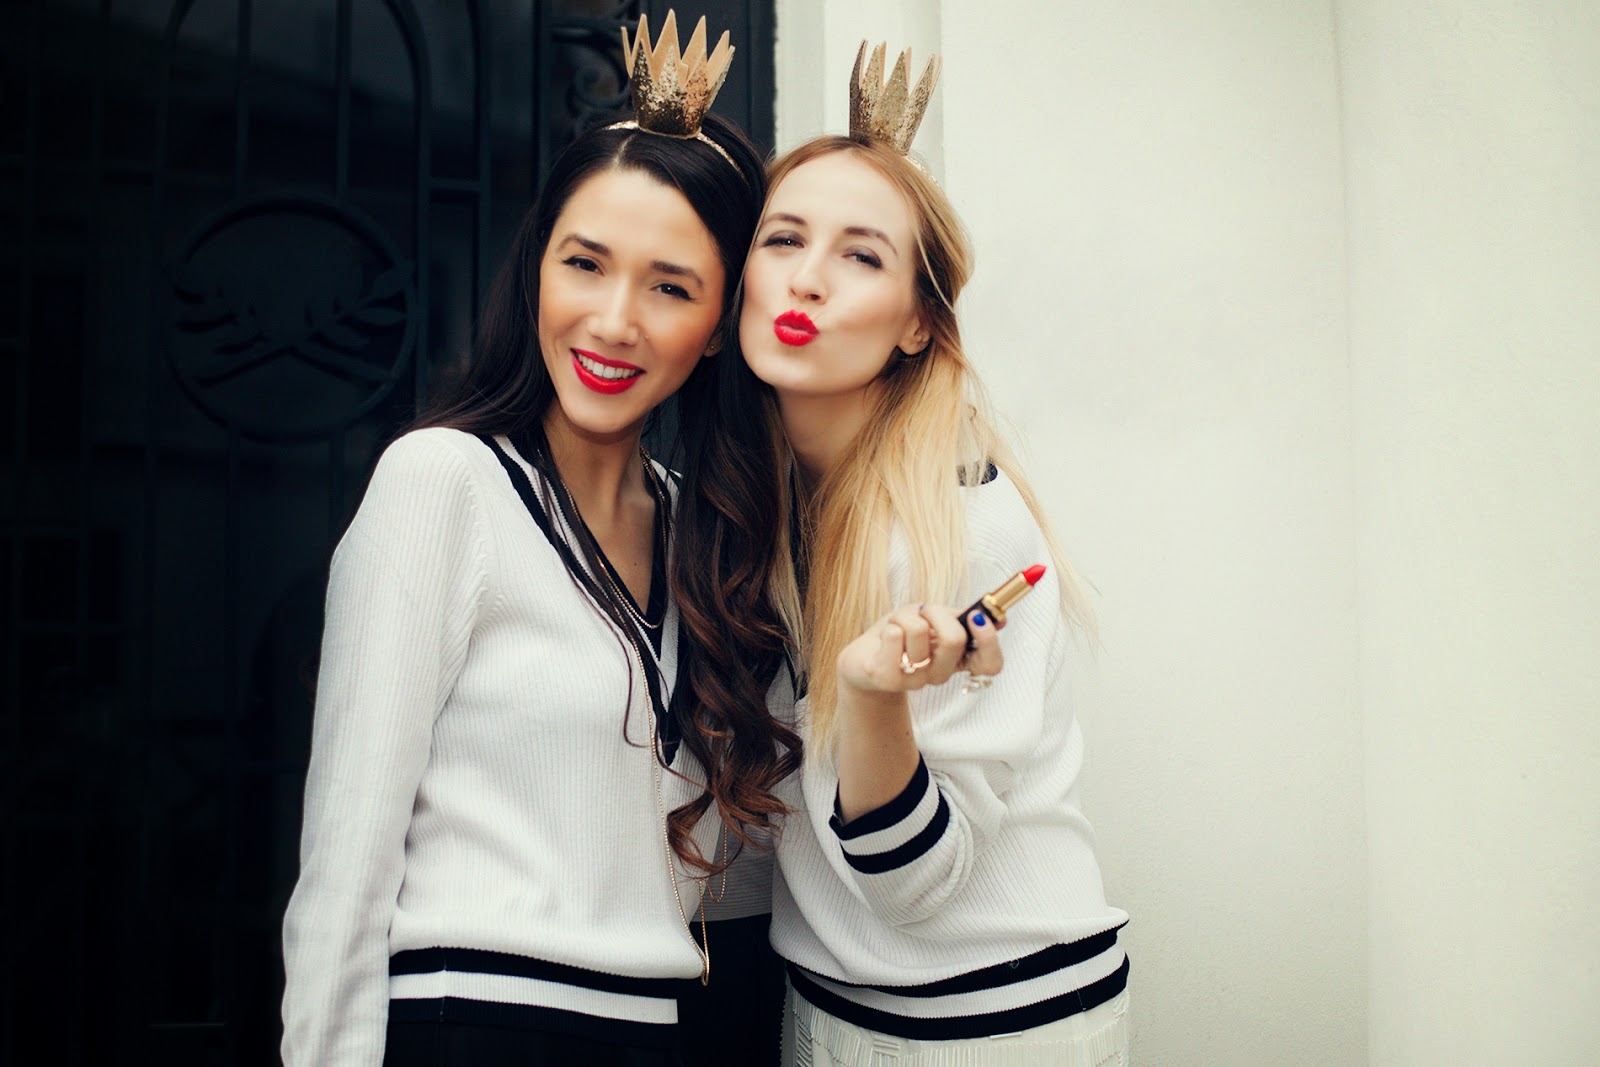 loreal lipstick_ruj loreal_red lipstick_fabulous muses_diana enciu_alina tanasa (2)